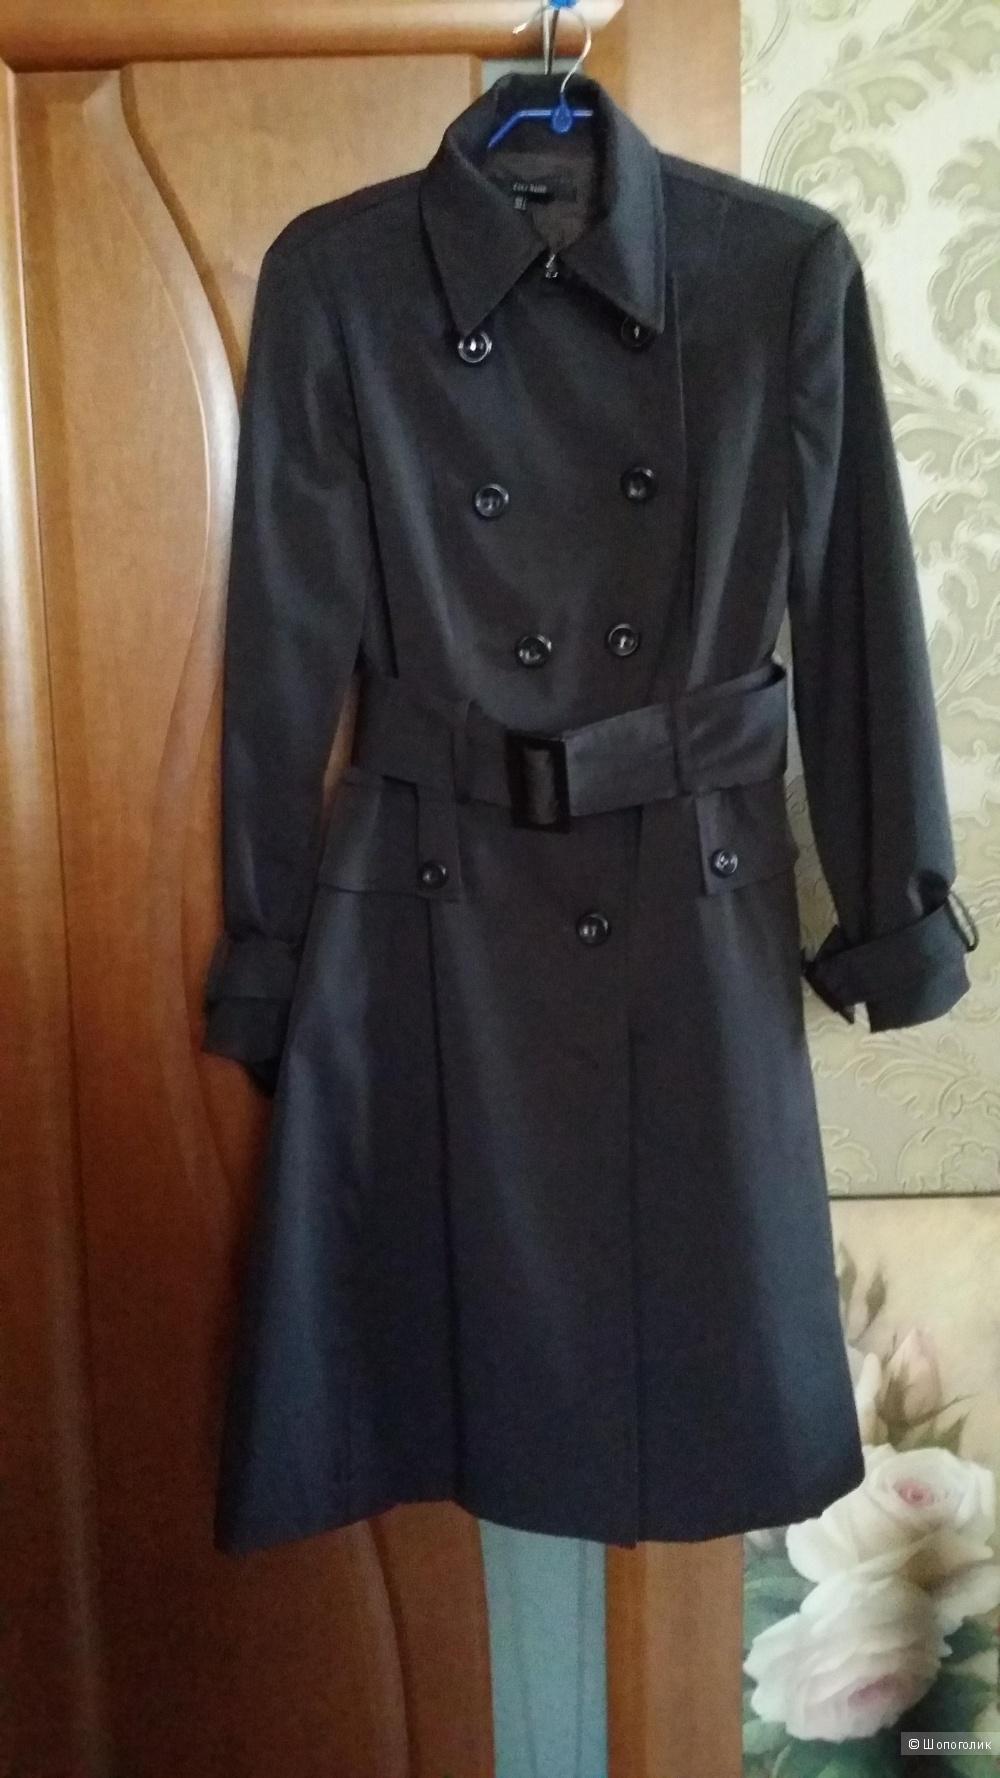 Плащ-пальто Zara Basic шоколадного цвета 46-48 размера